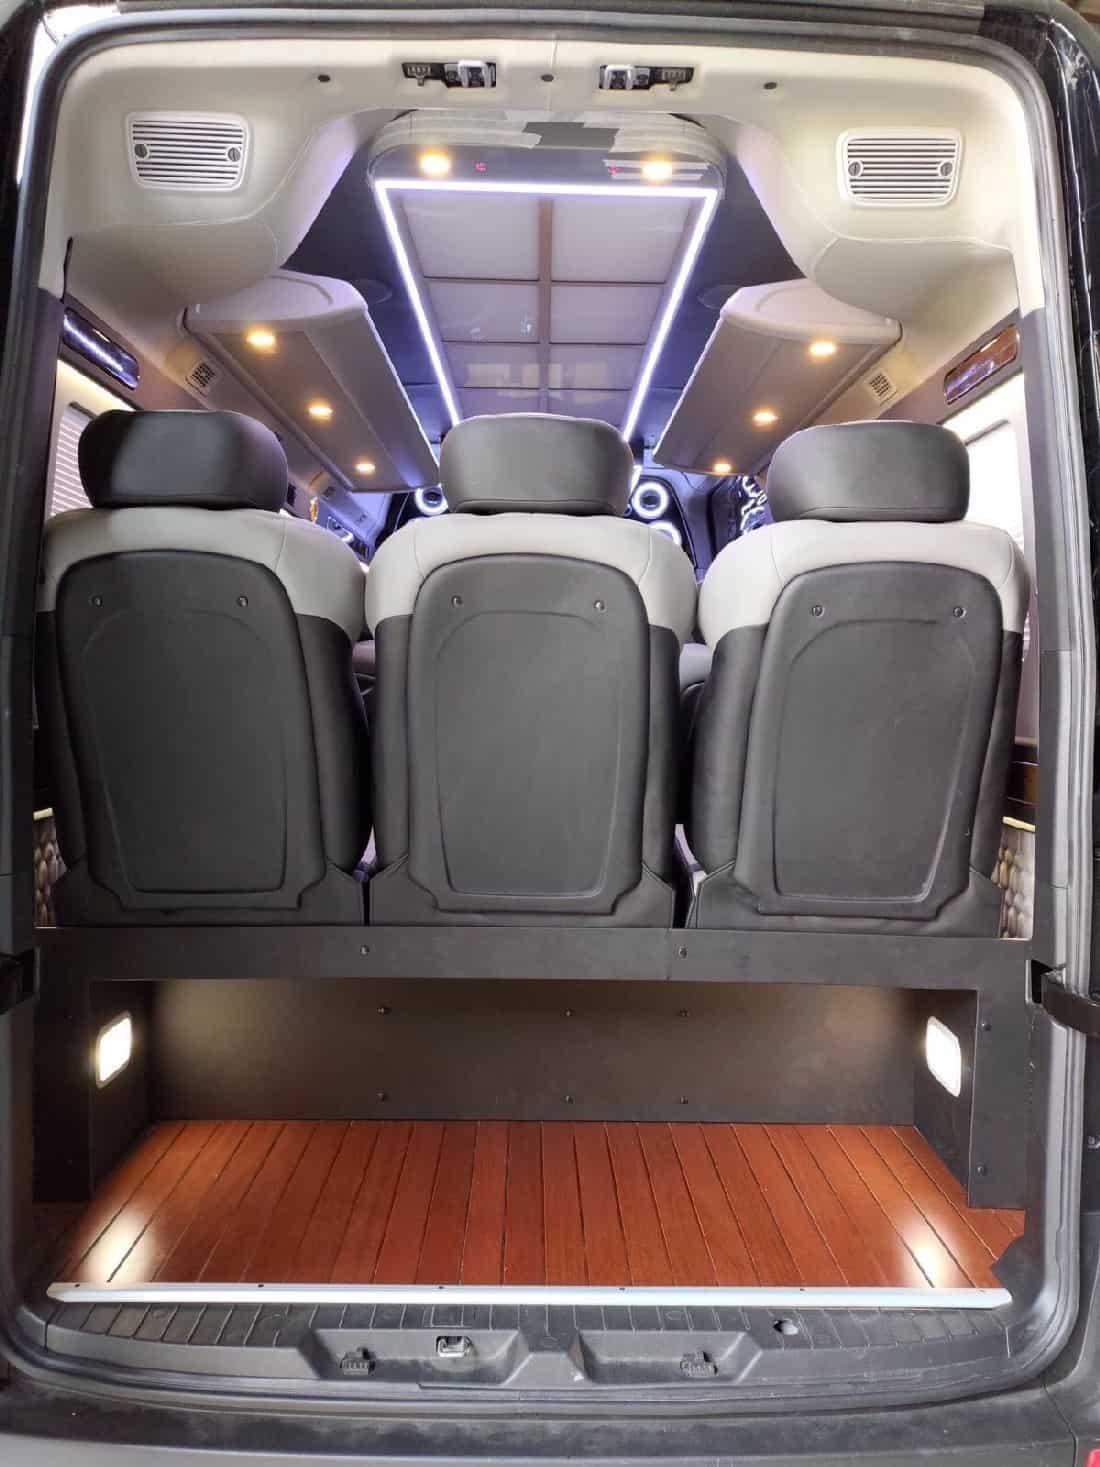 xe 12 cho hyundai solati 2020 citylimo36